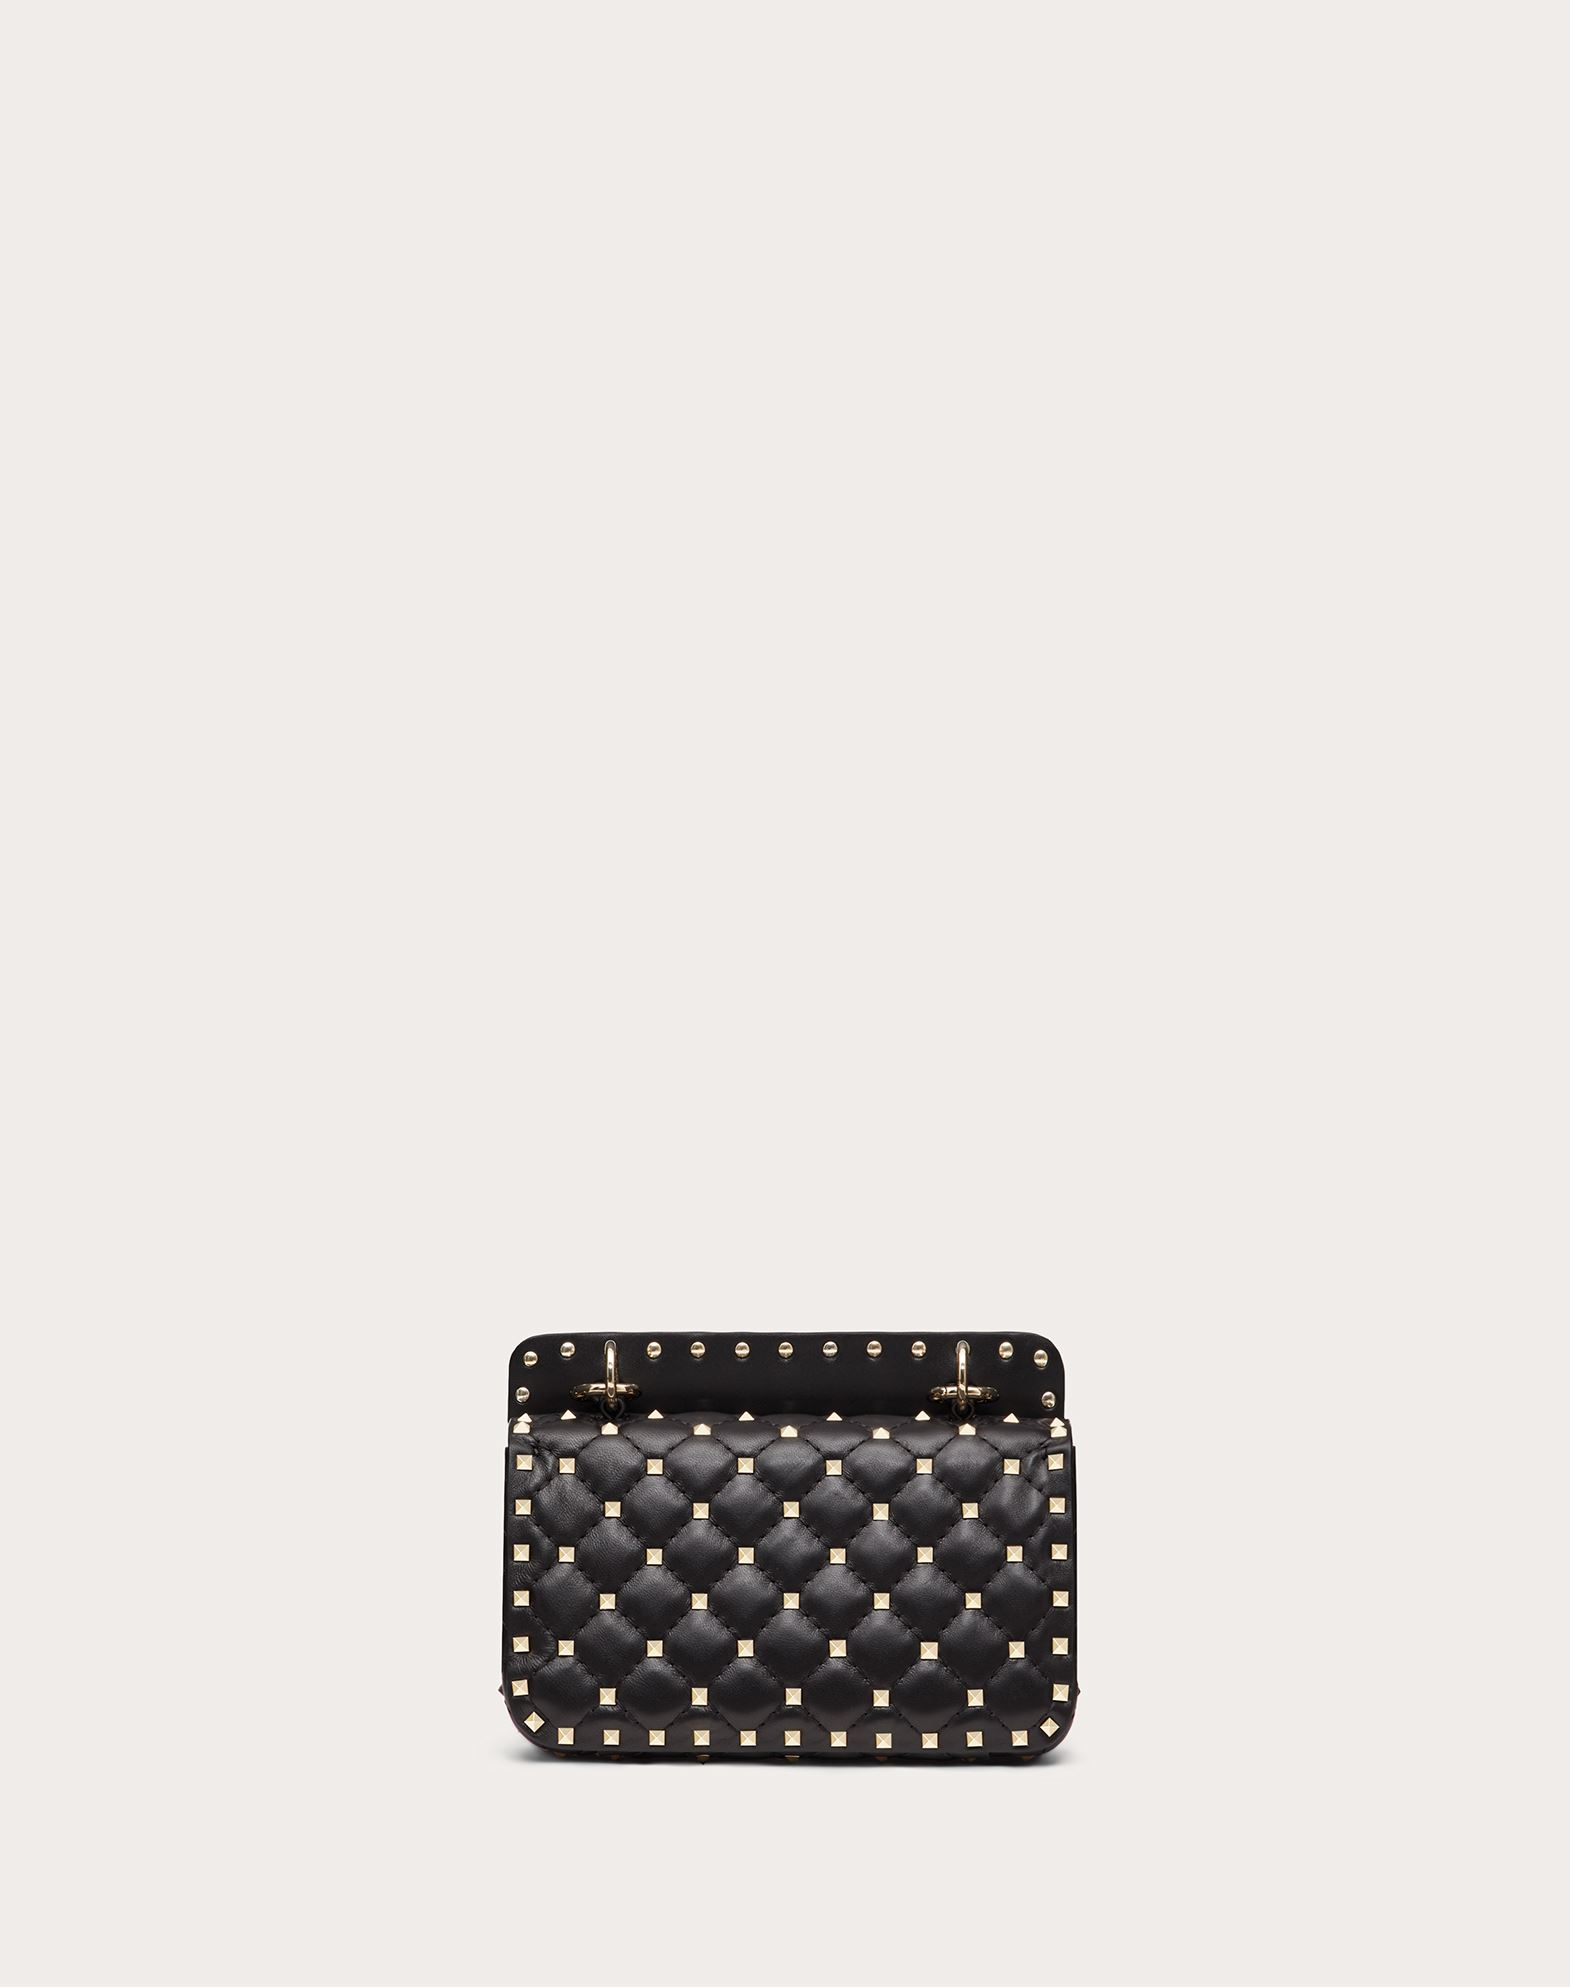 VALENTINO GARAVANI Rockstud Spike Small Chain Bag Shoulder bag D d